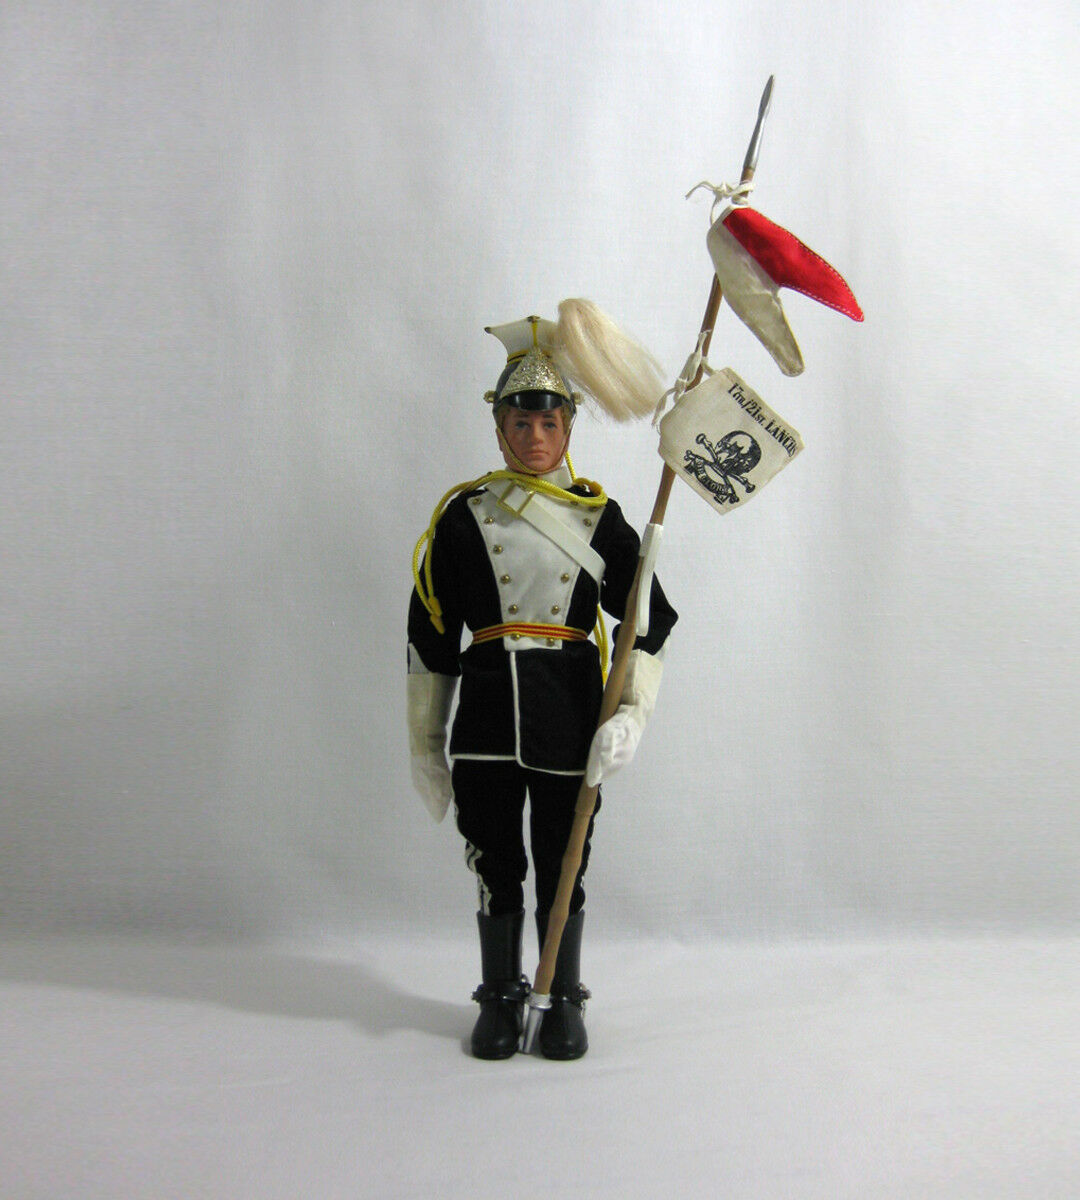 1972 Vintage Action Man ✧ 17th   21st Lancers ✧ Palitoy Hasbro G.I JOE